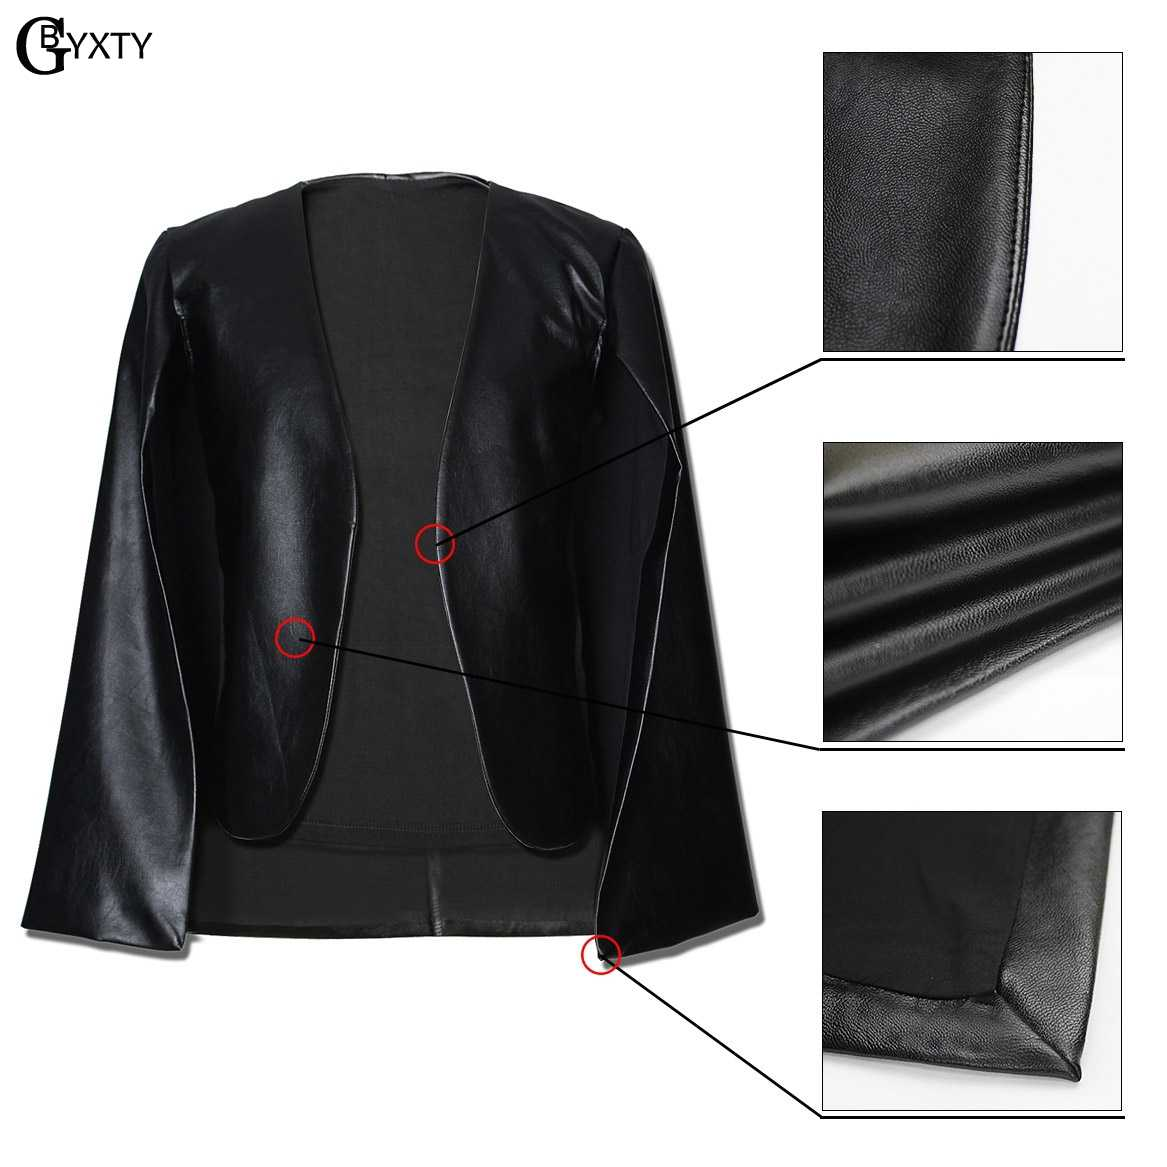 GBYXTY Ladies Blazers feminino Faux Leather PU Black Blazer Jacket Women Long Sleeve Short Blazer Coat Cloak bleiser mujer ZA104